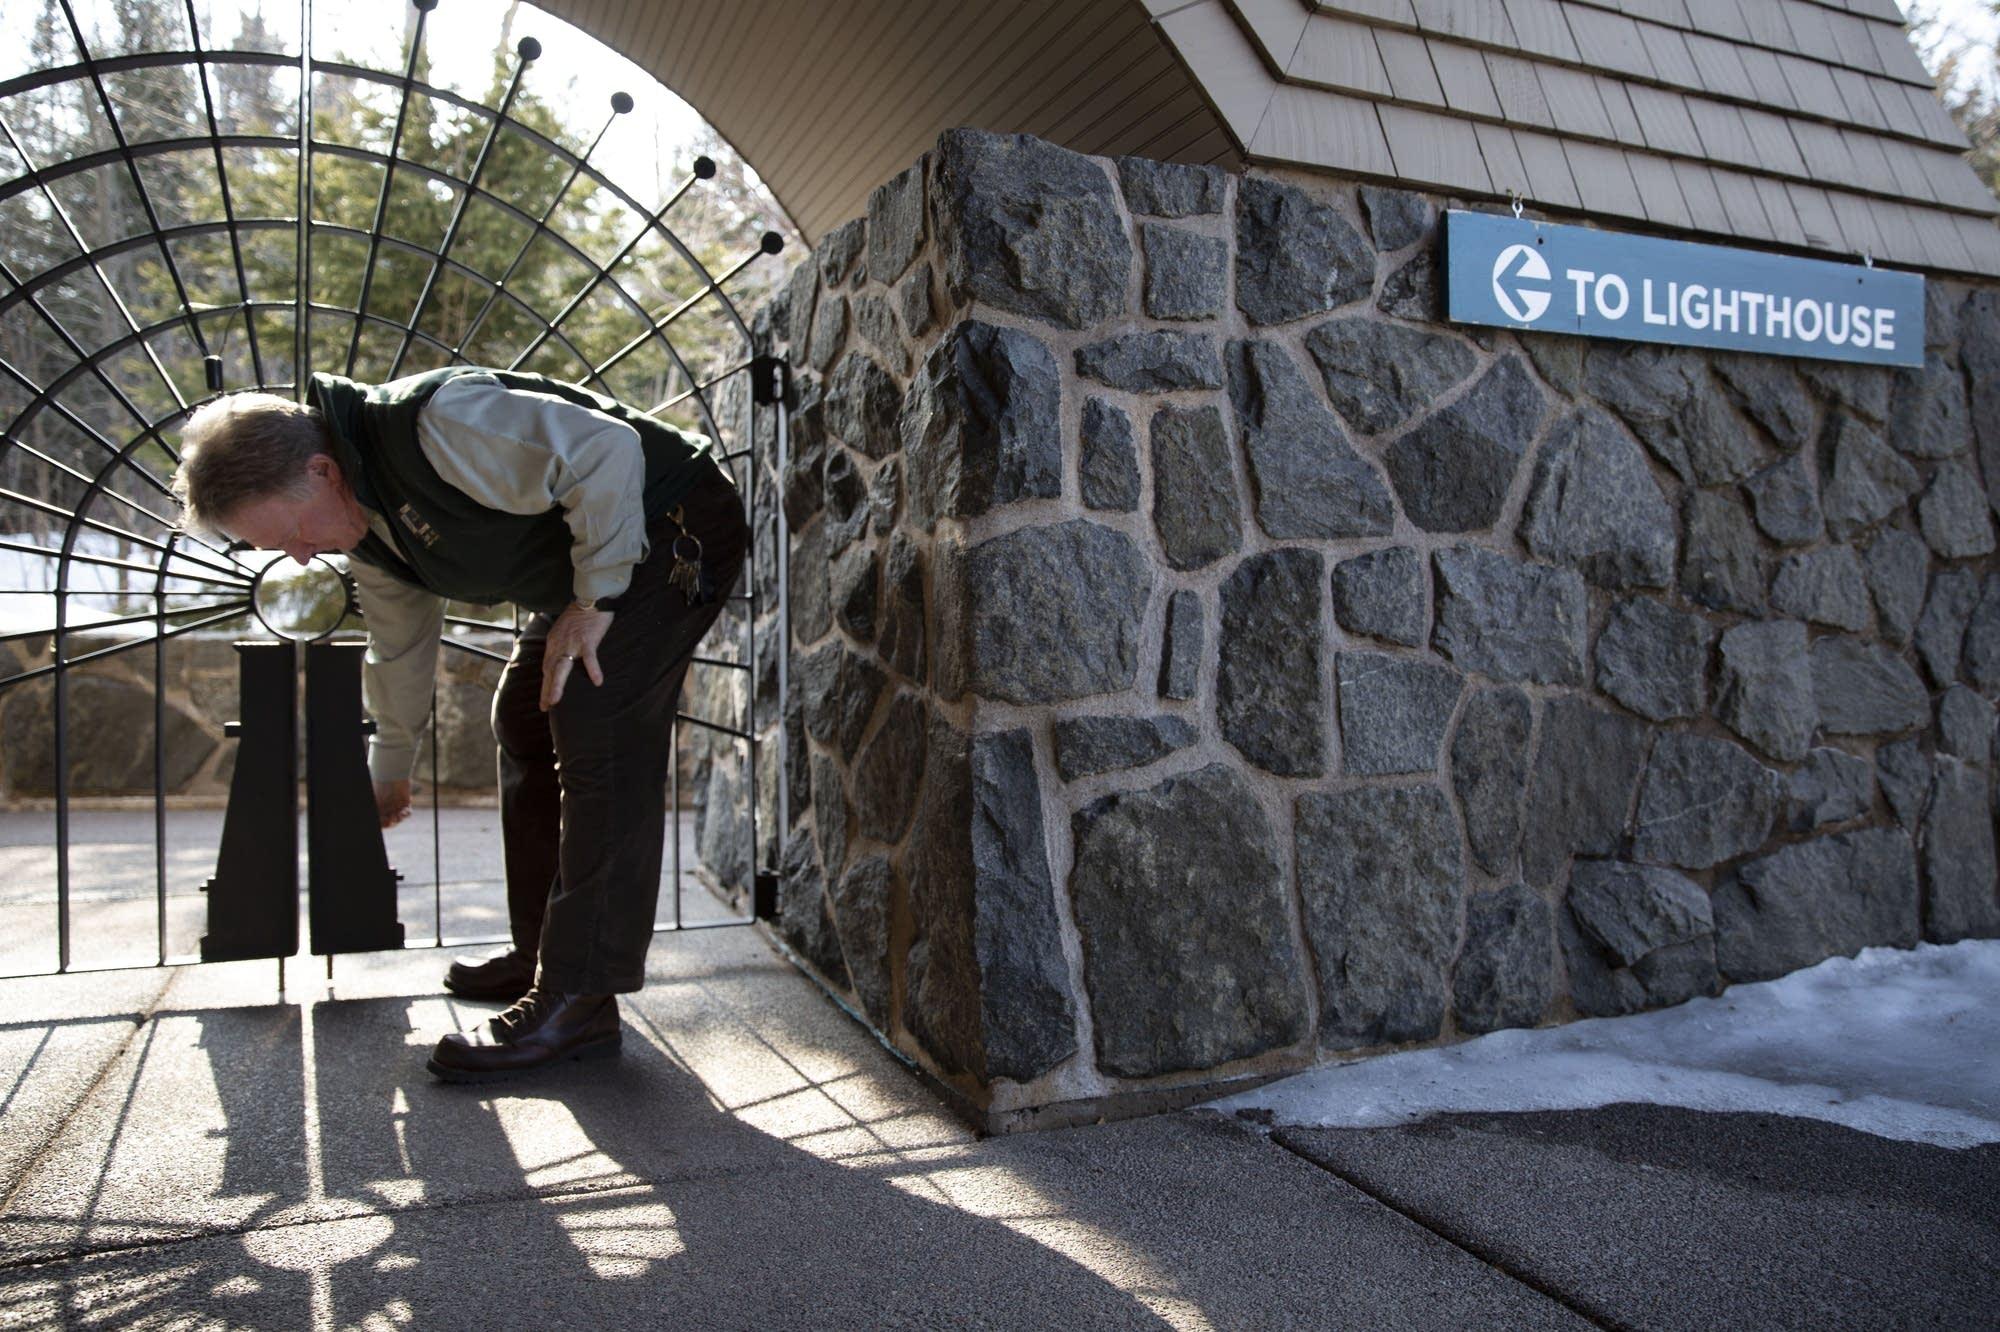 Lee Radzak opens a gate to the Split Rock Lighthouse.